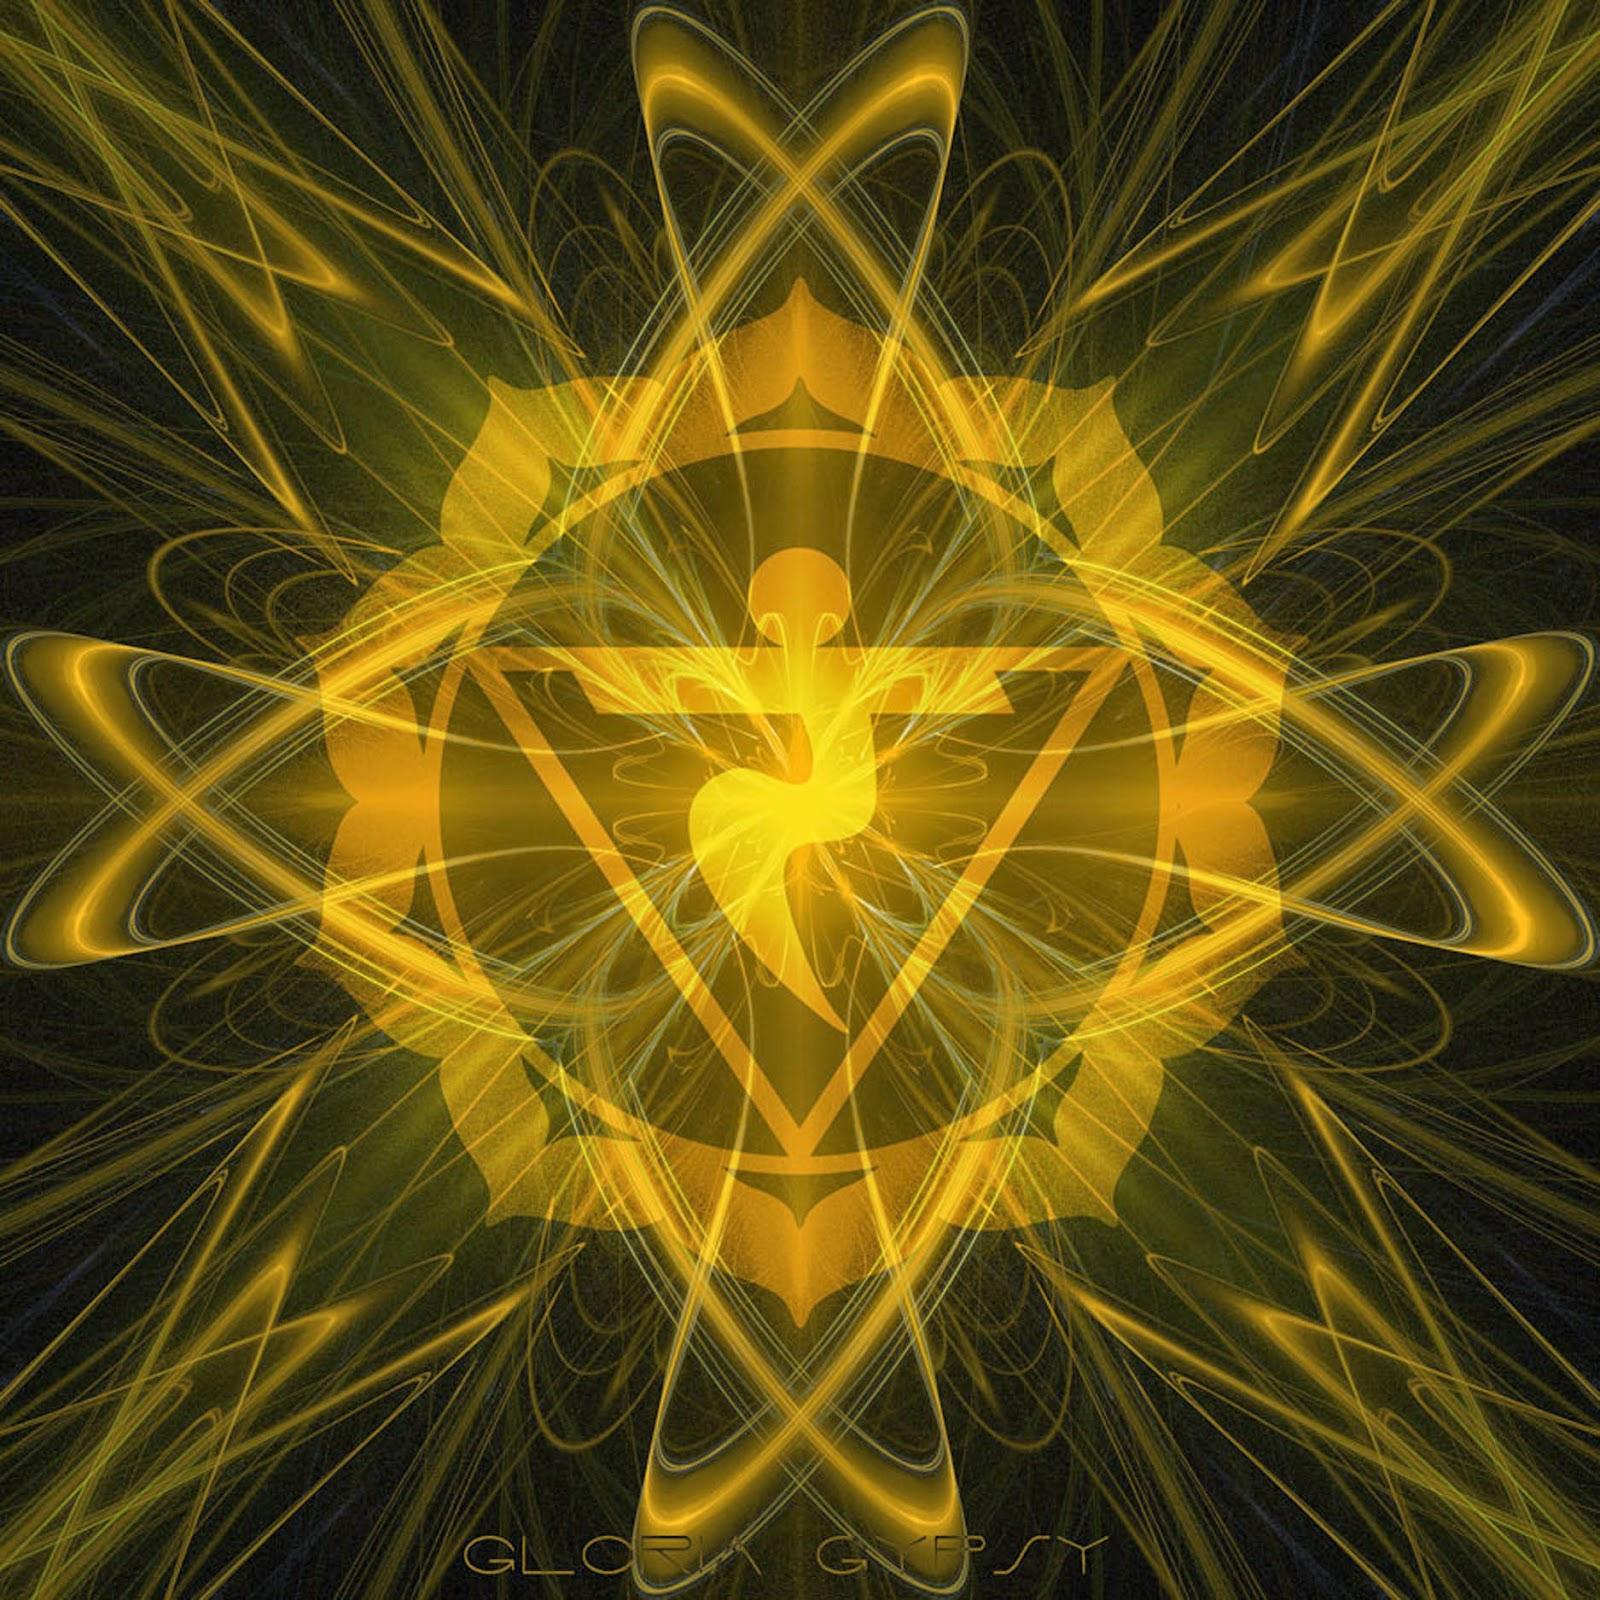 Manipura Solar Plexus Chakra by Gloria Gypsy